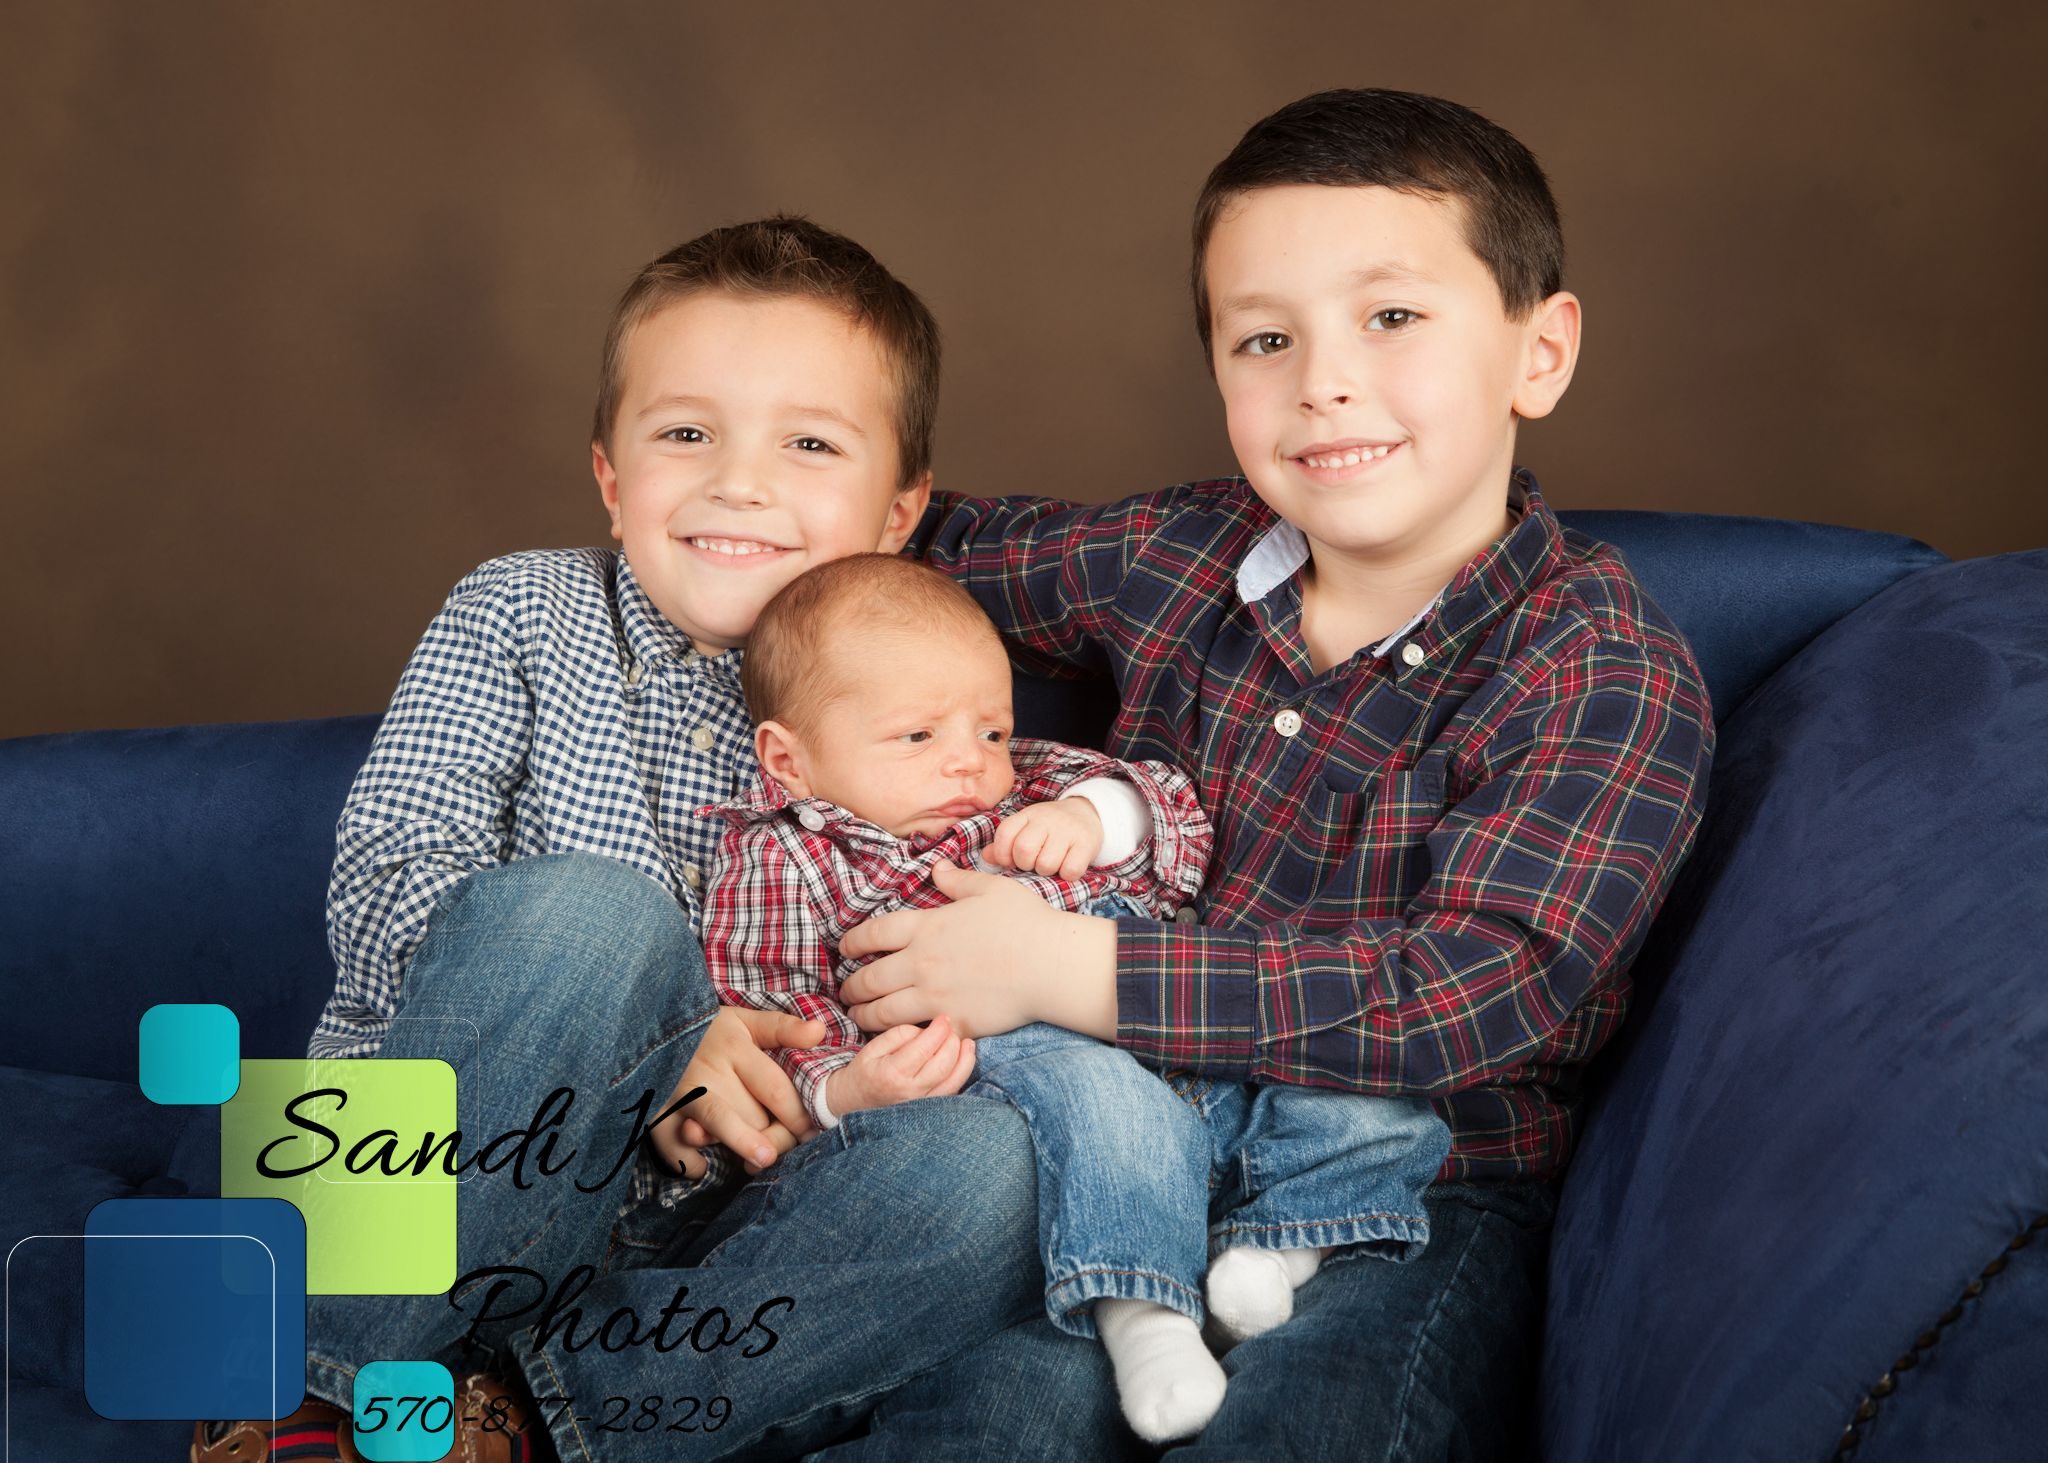 children photography, kids pictures, family photos, family pictures, 570, nepa, scranton, poconos